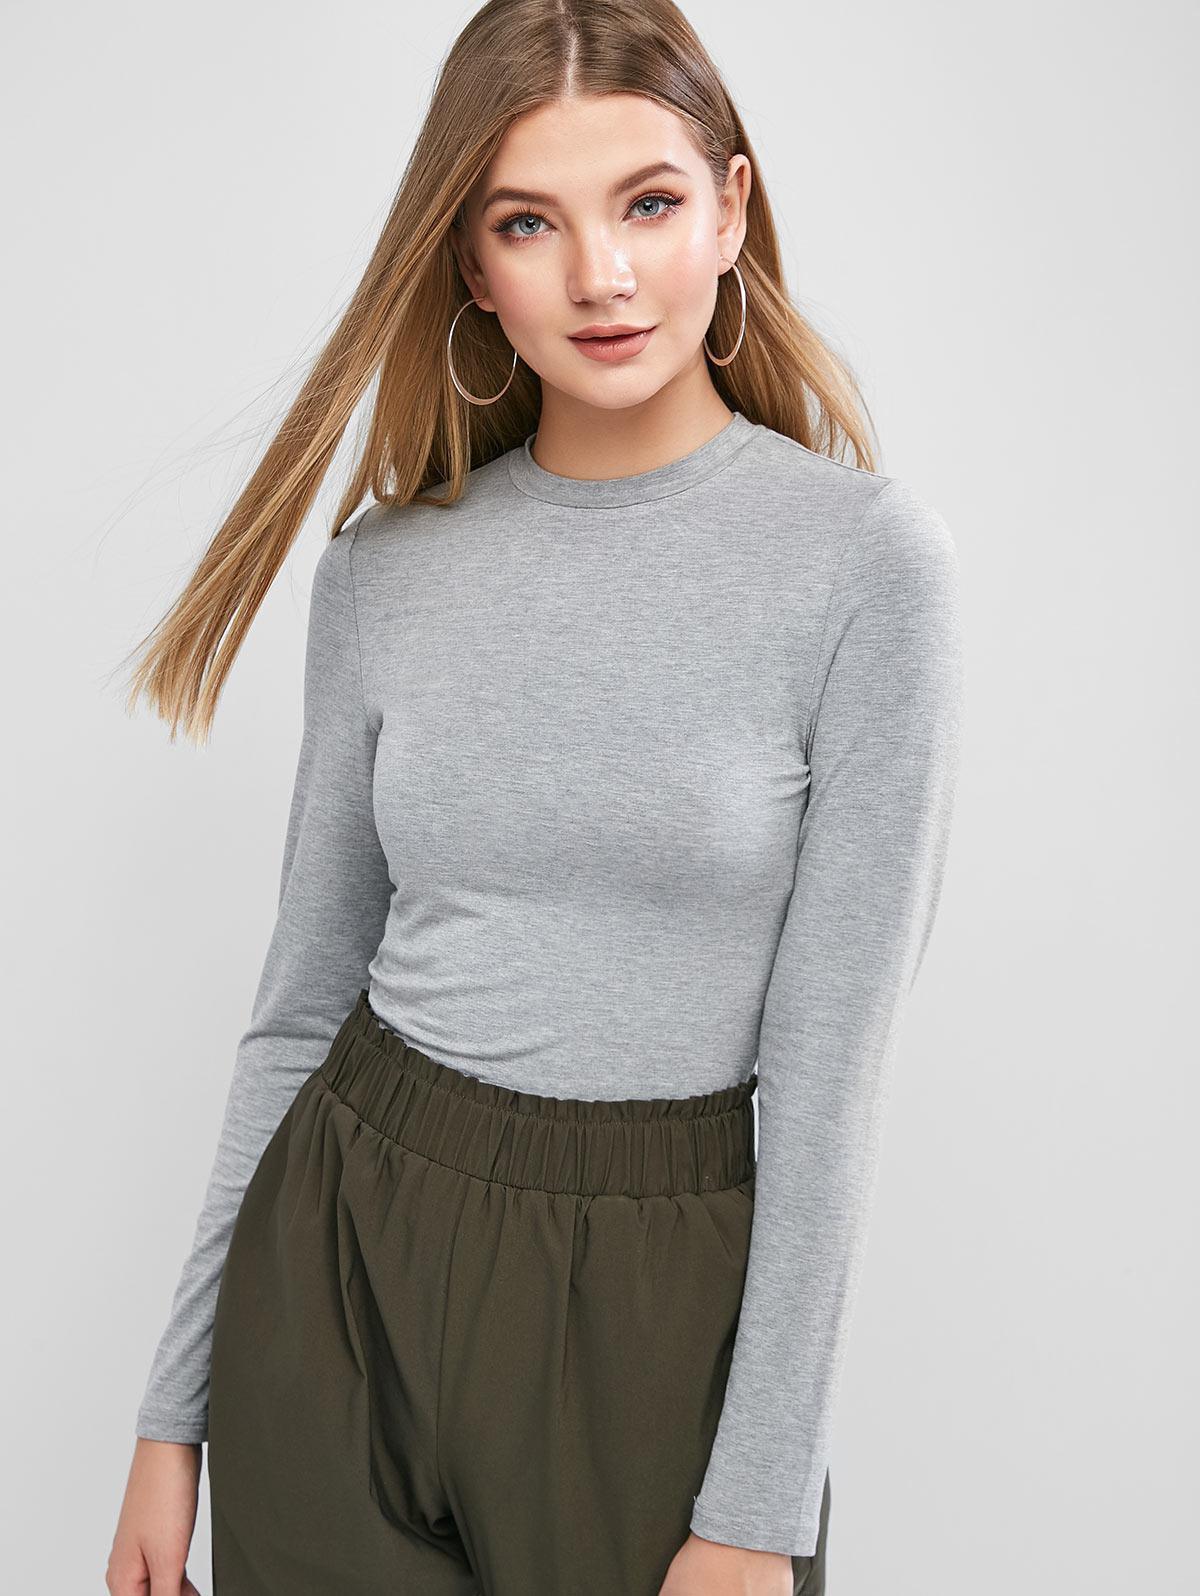 ZAFUL Long Sleeve Heather Basic T-shirt фото